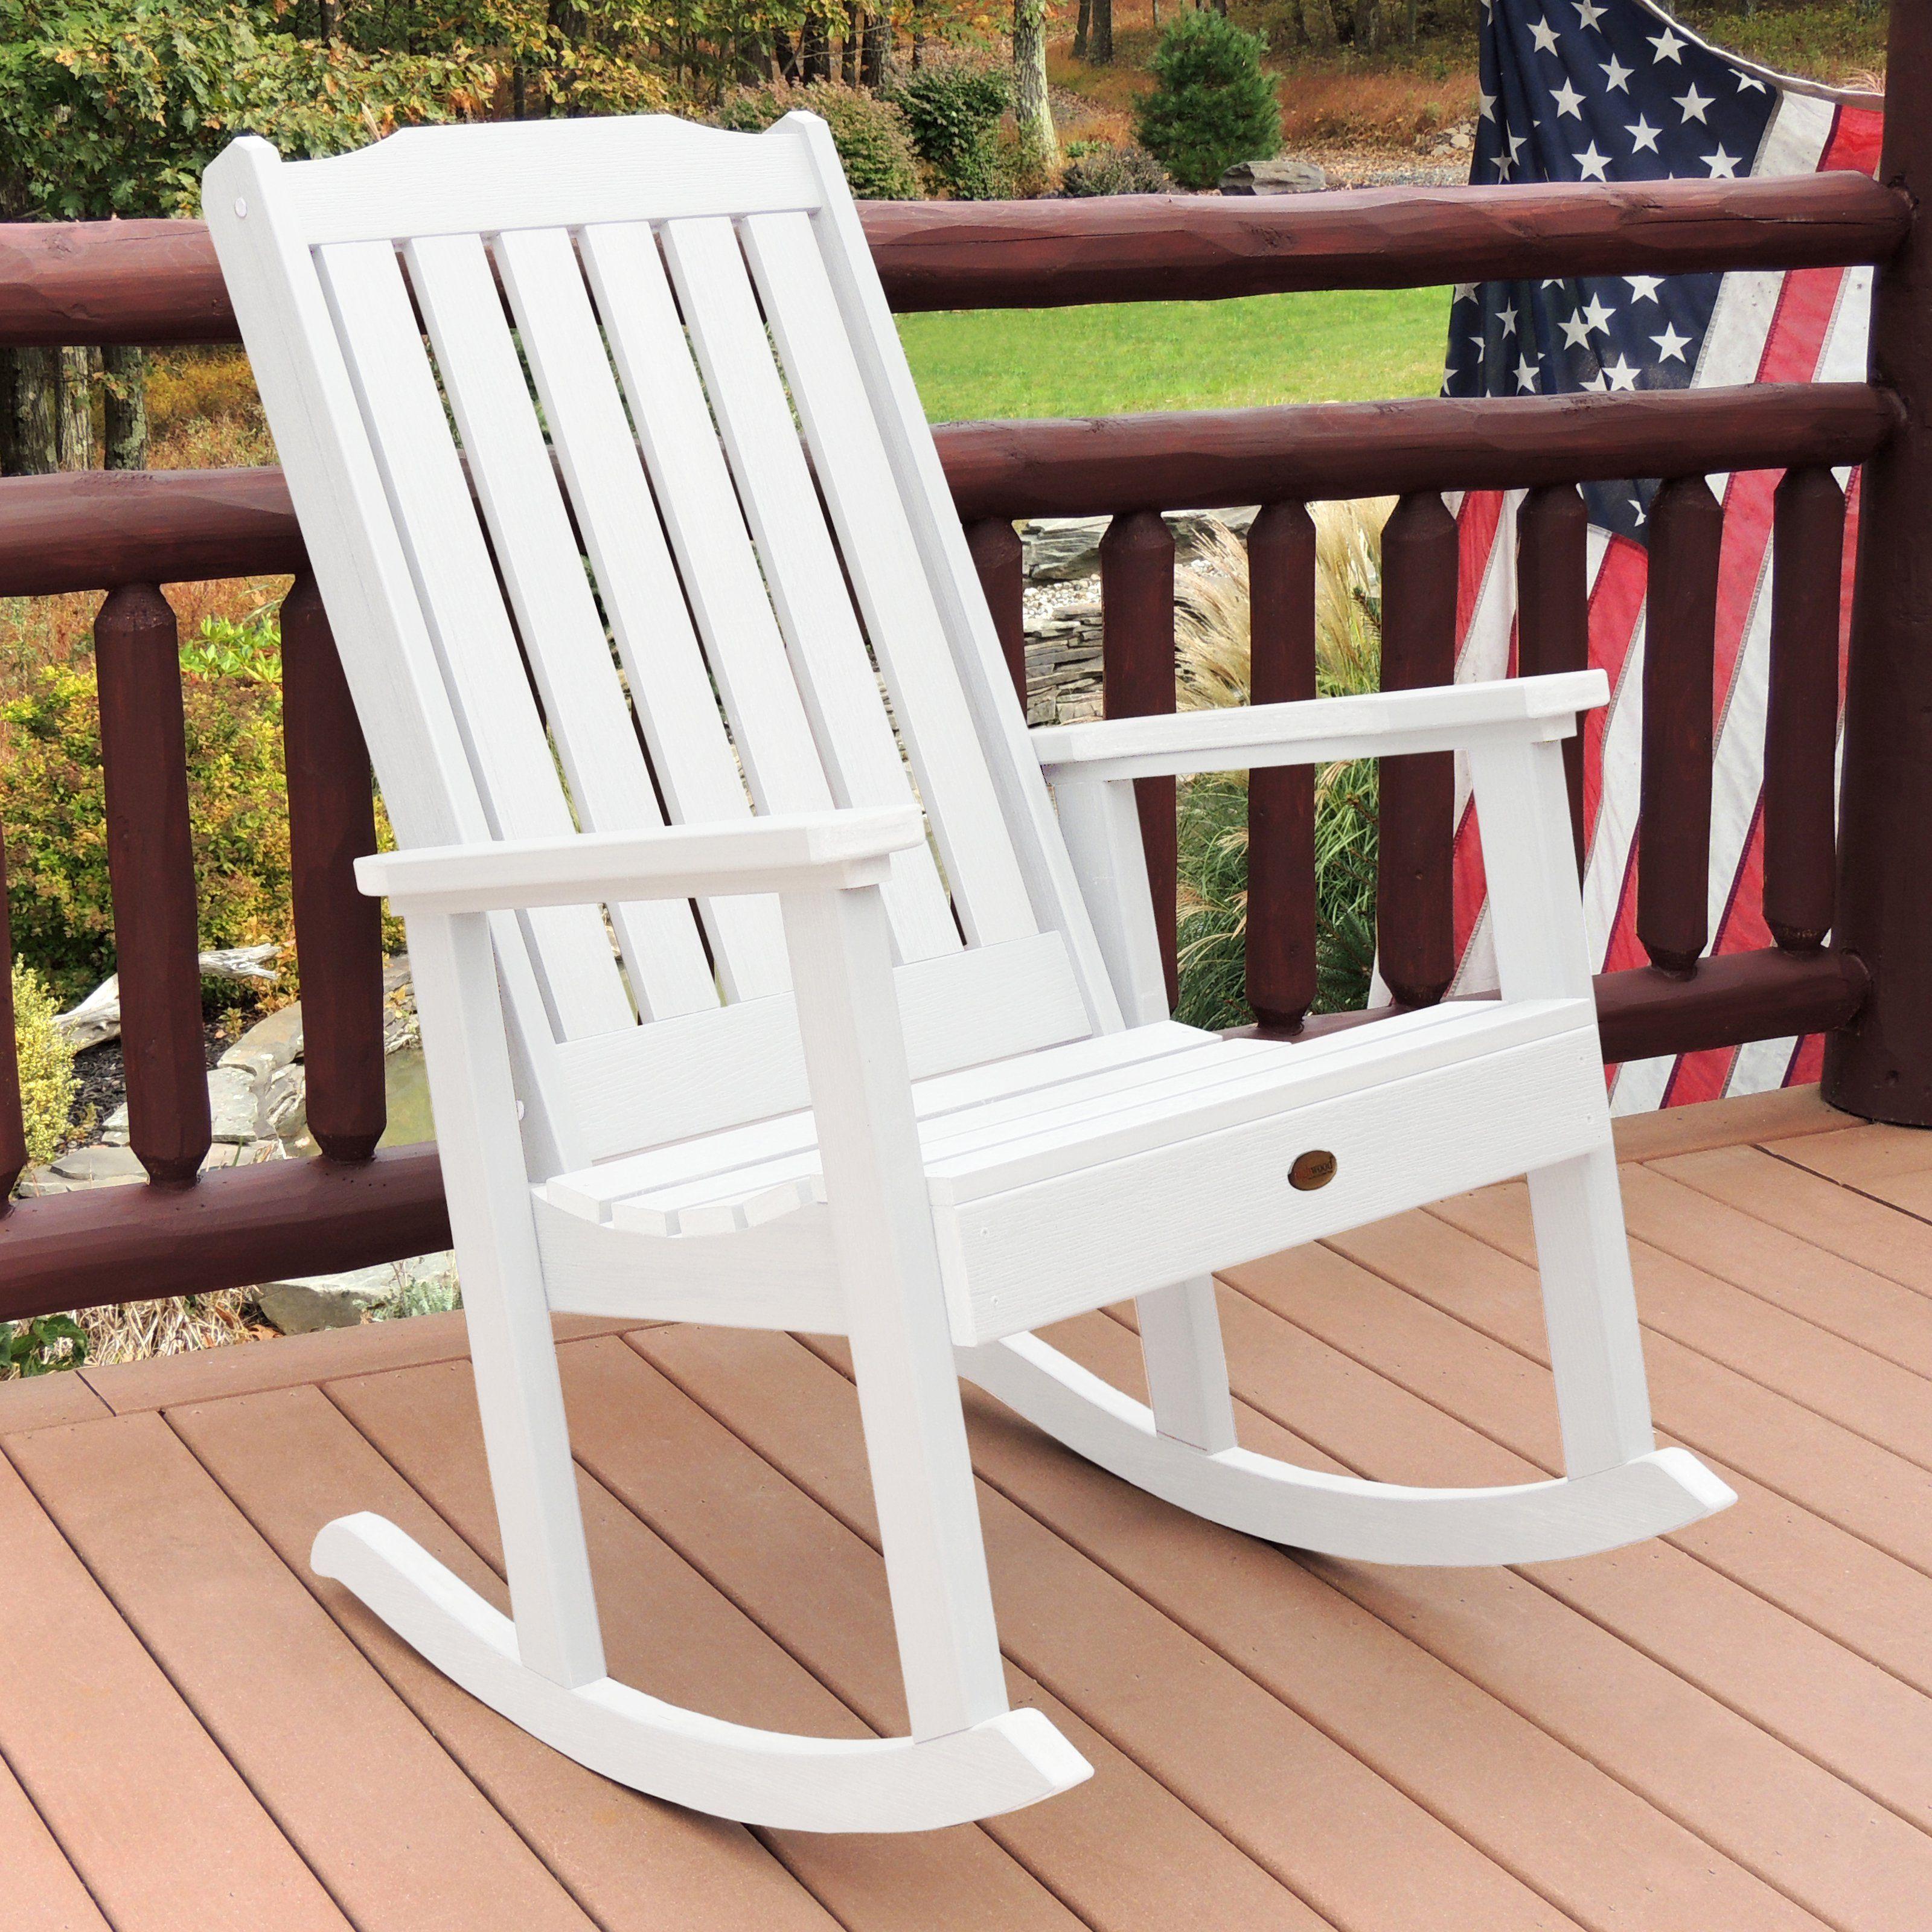 Outdoor plastic rocking chair - Highwood Lehigh Recycled Plastic Rocking Chair From Hayneedle Com